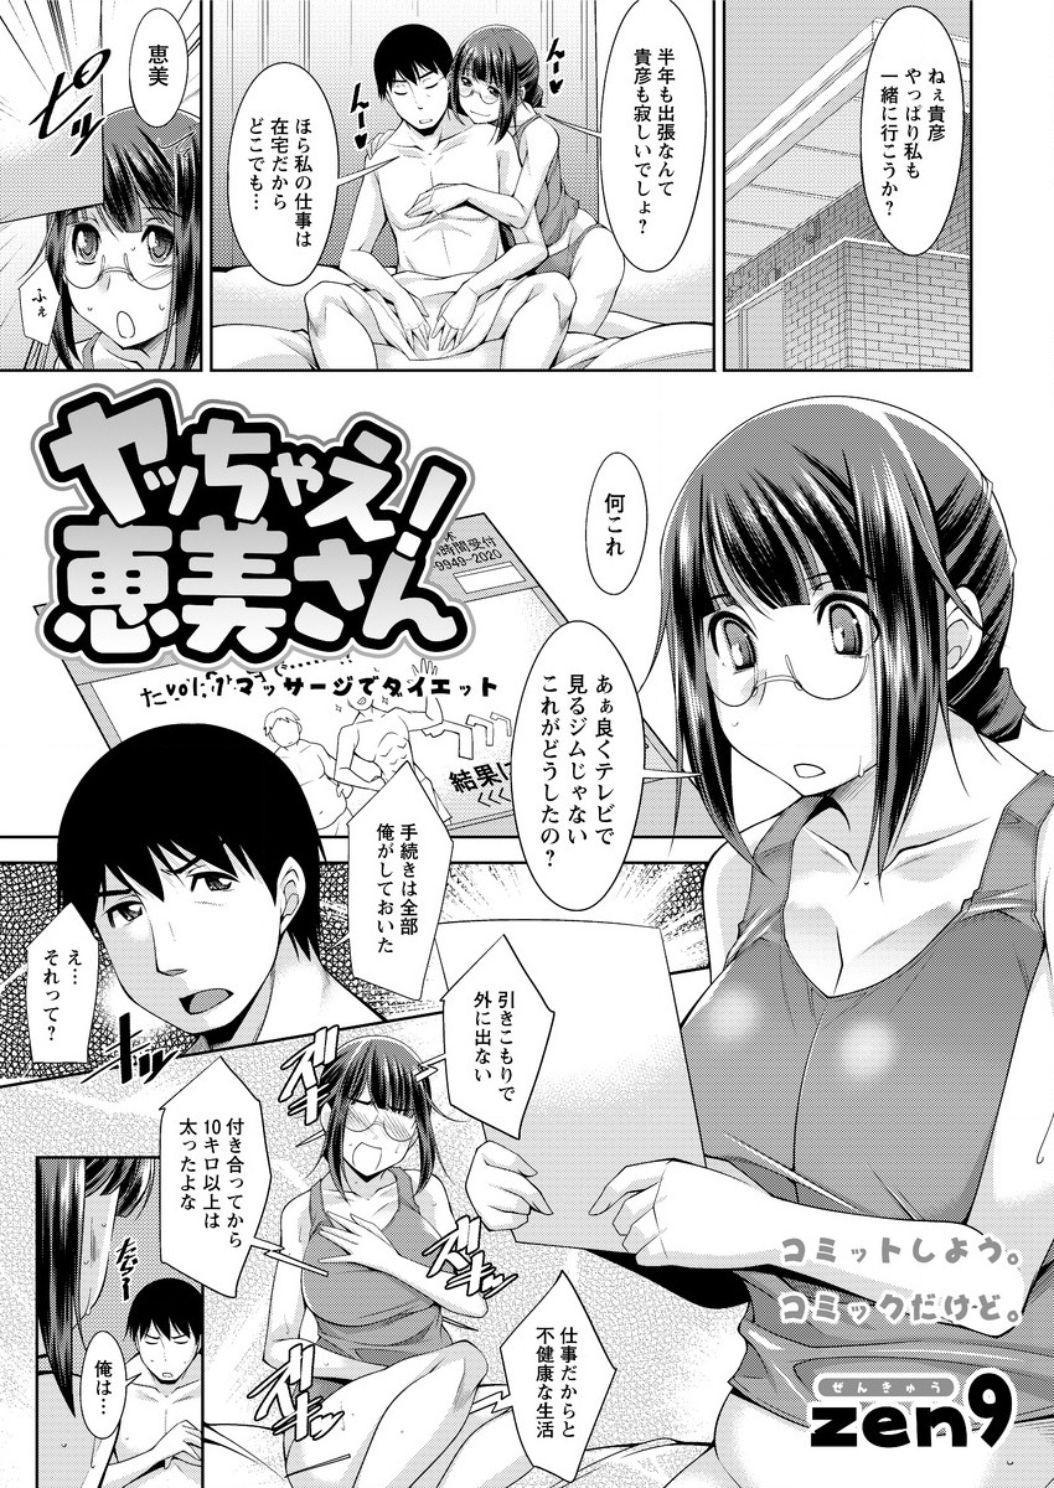 [zen9] Yacchae! Megumi-san | Do it! Megumi-san Ch 1-6 4